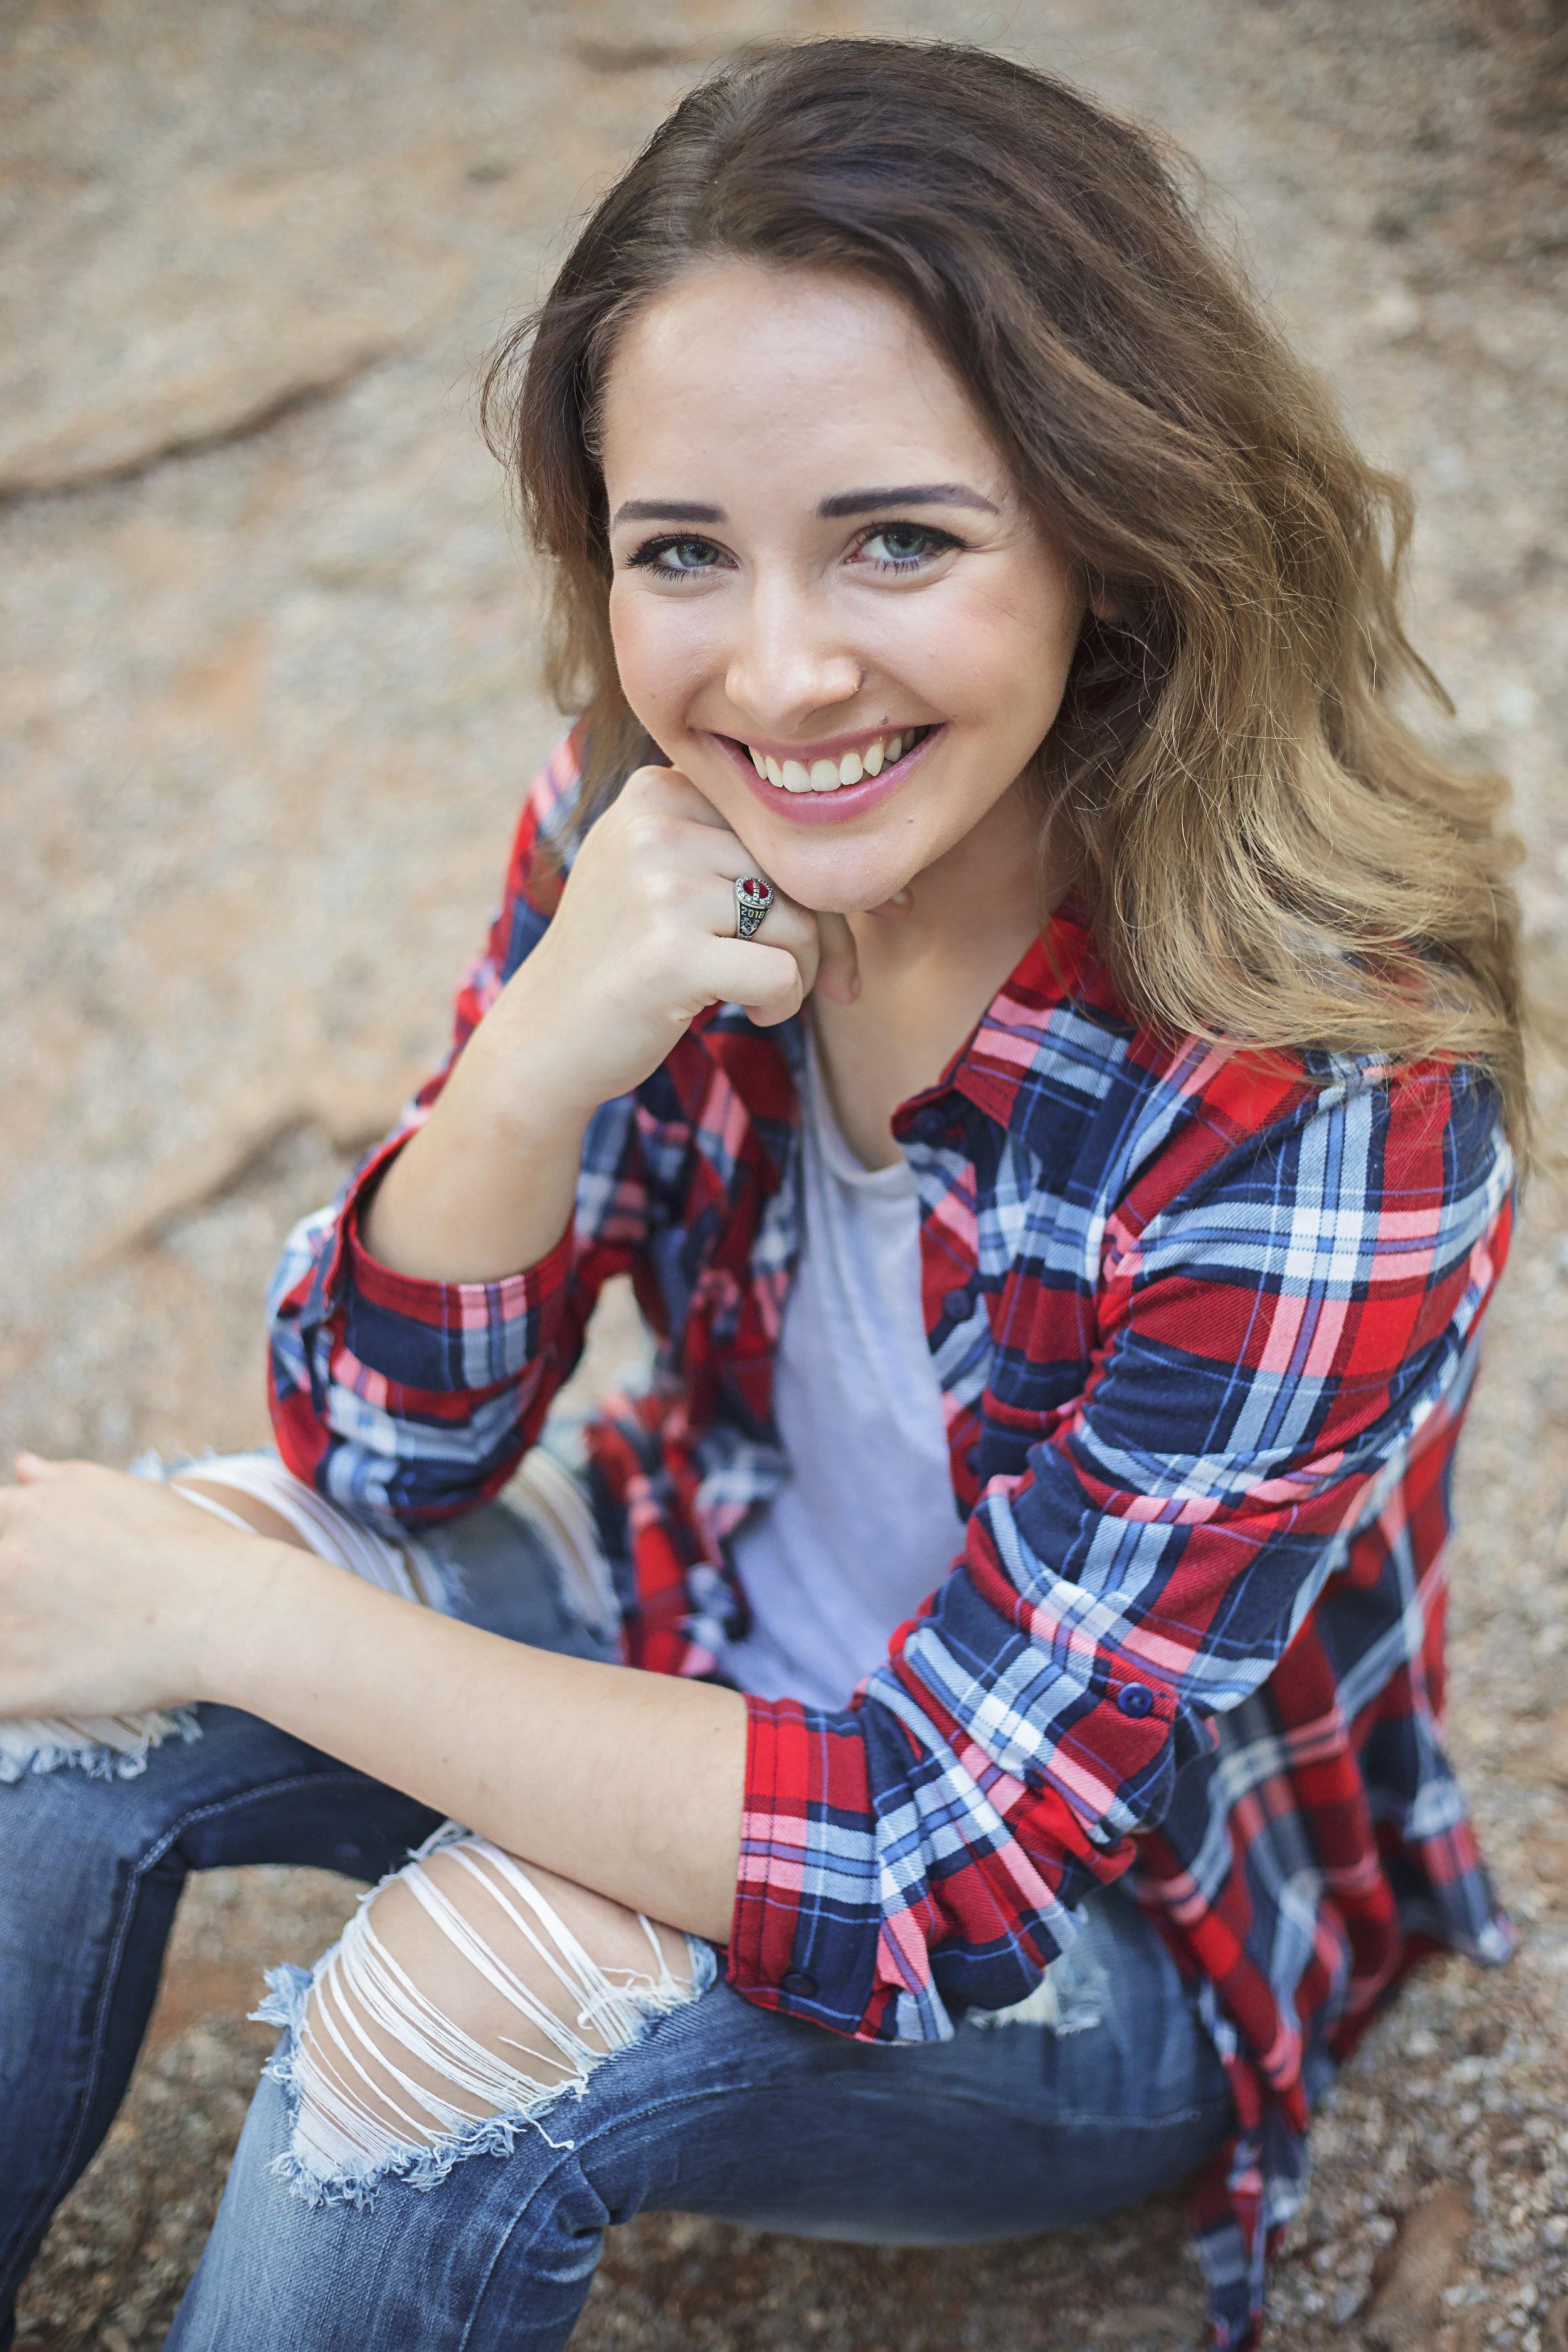 High School Senior Portrait of girl with long brown hair wearing flannel sitting on rock pathway at a park in Oklahoma City. Amanda Lynn Oklahoma Senior Photographer.